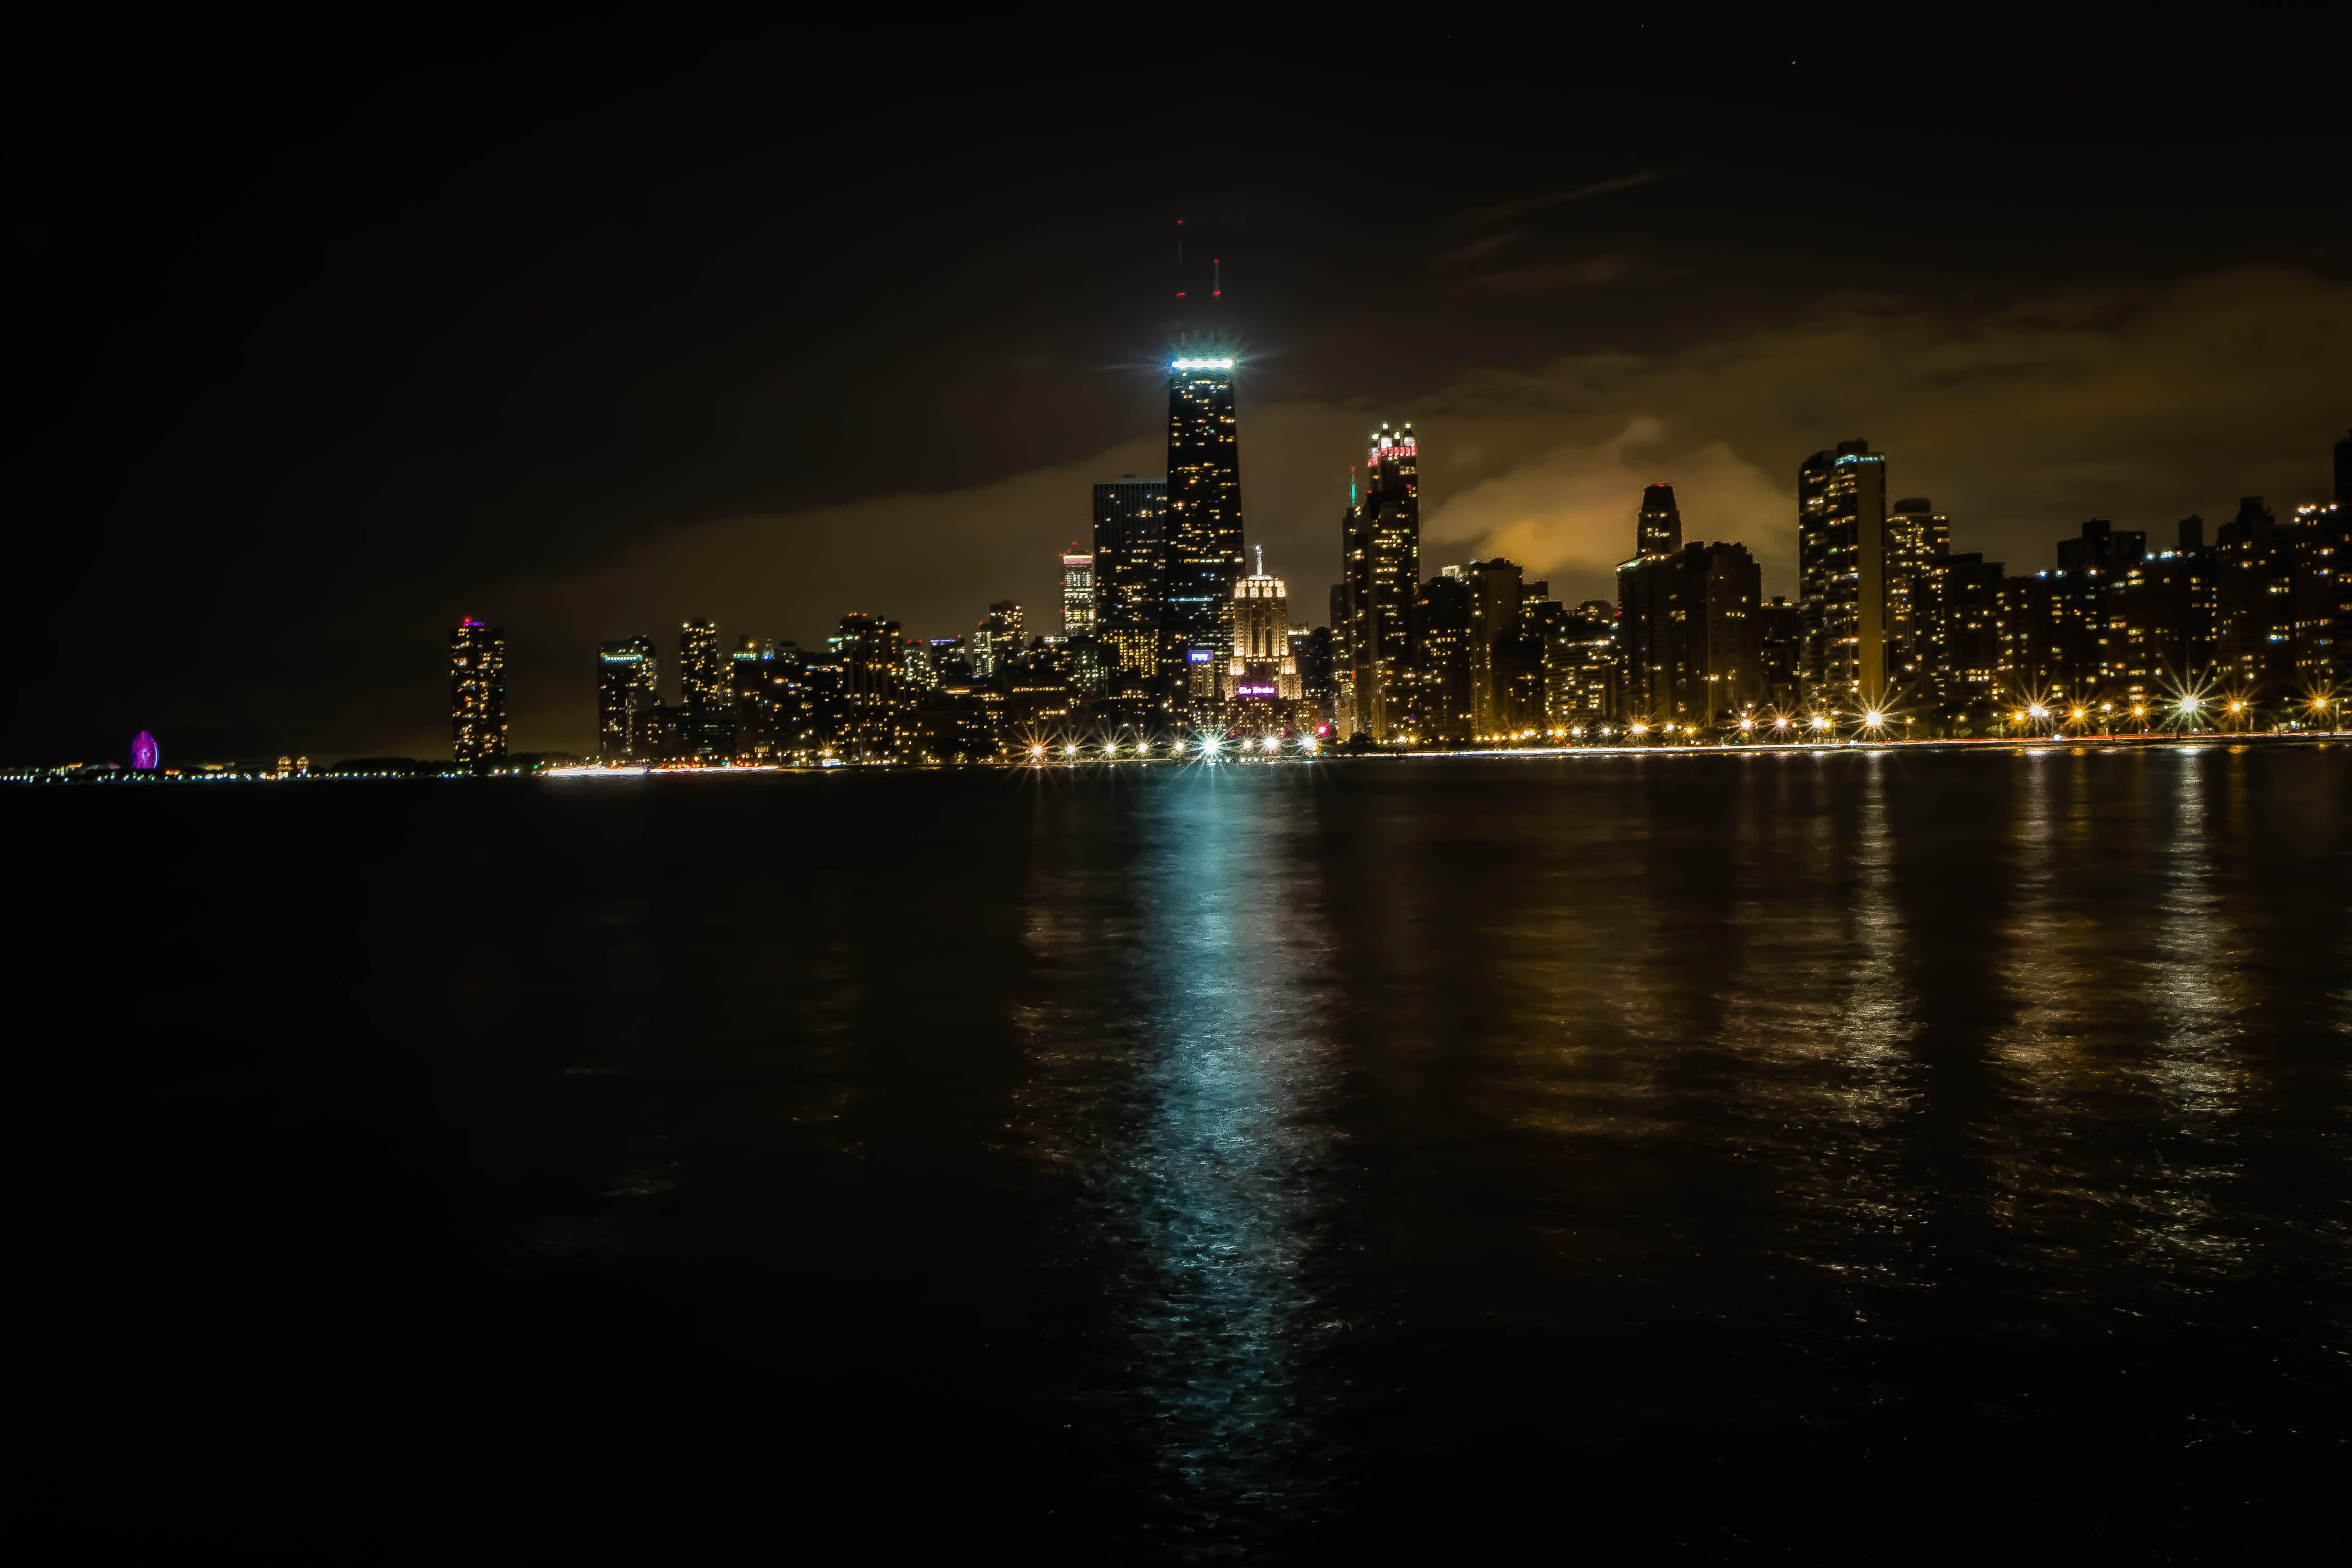 Free stock photo of city, city lights, chicago, lake michigan